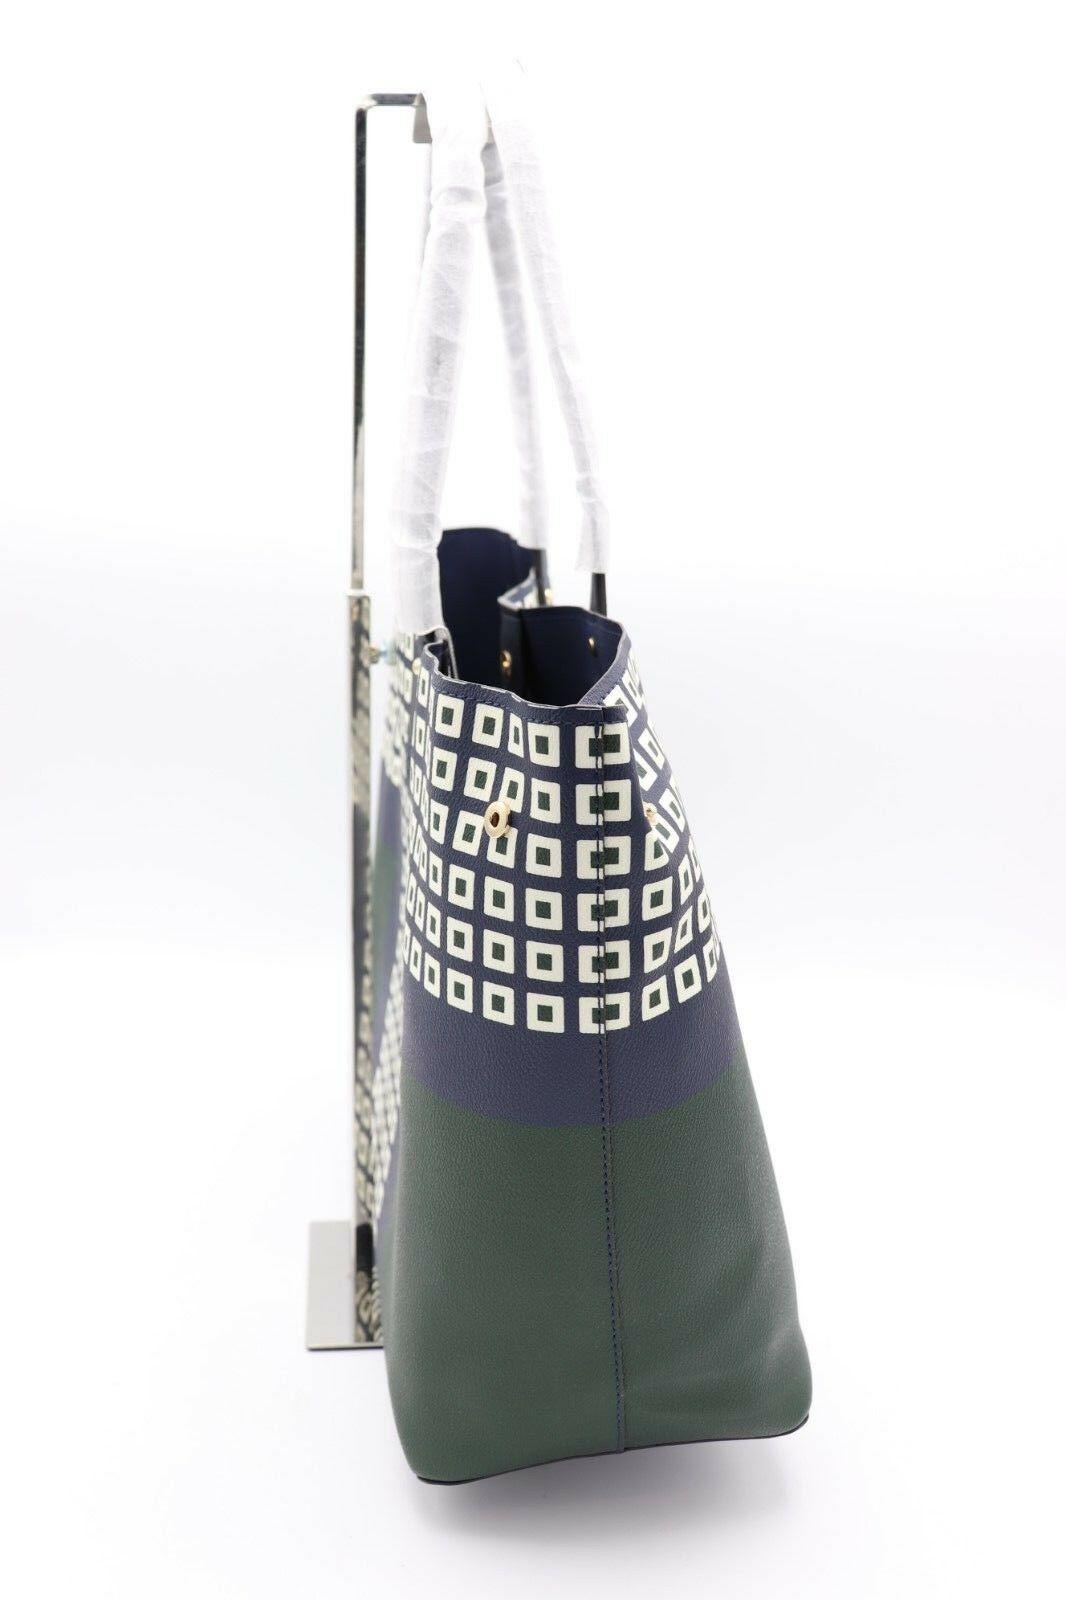 NWT Tory Burch Kerrington Square Tote Green Milano Shoulder Bag New  $298 image 3